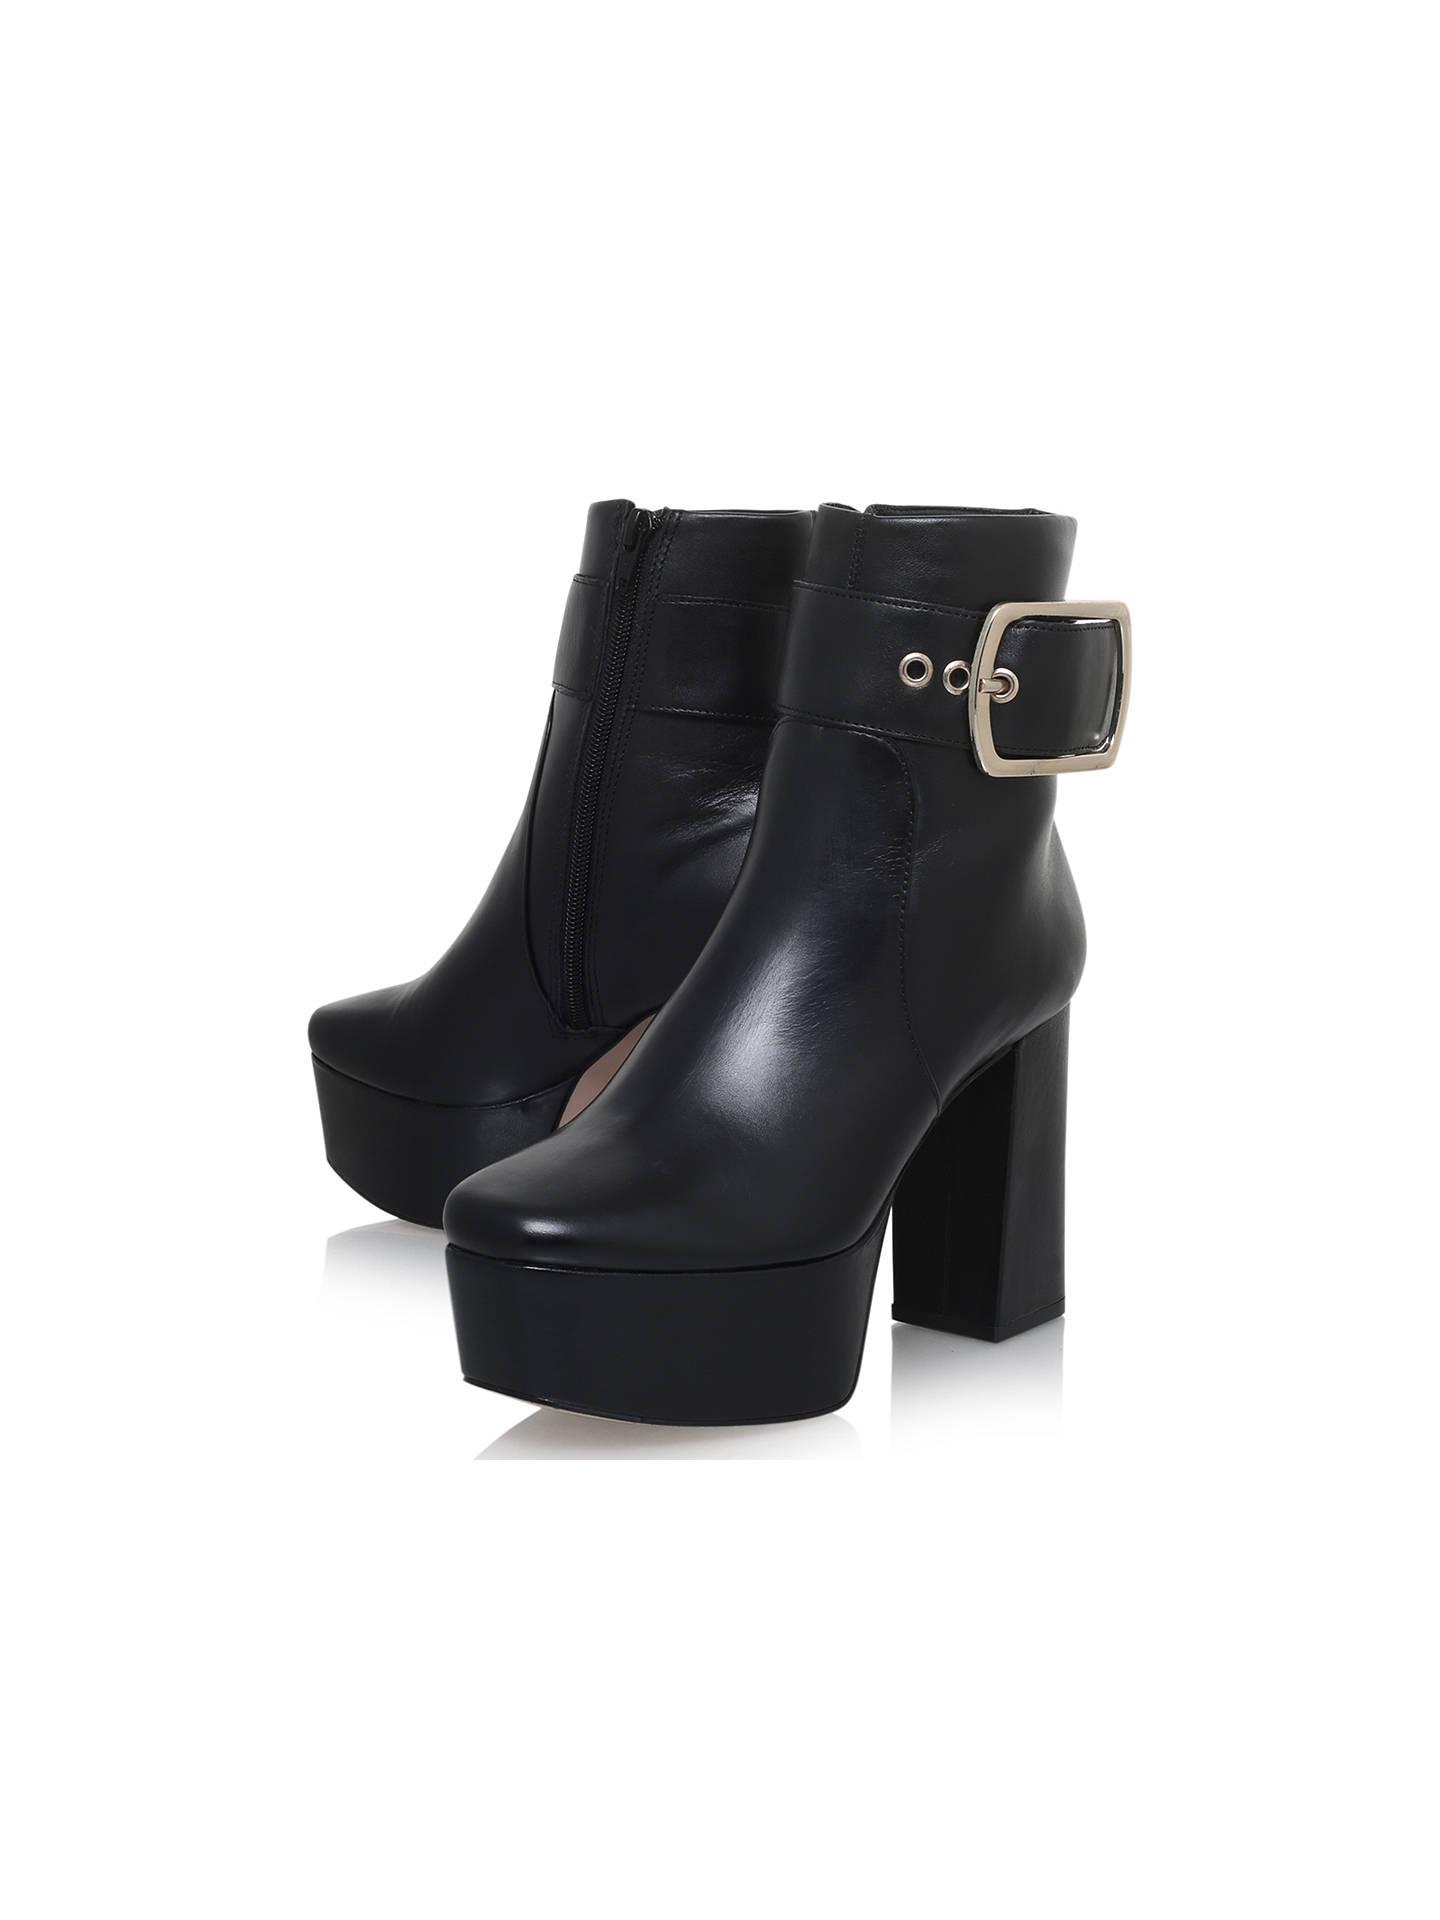 KG by Kurt Geiger Spritz Platform Block Heeled Ankle Boots